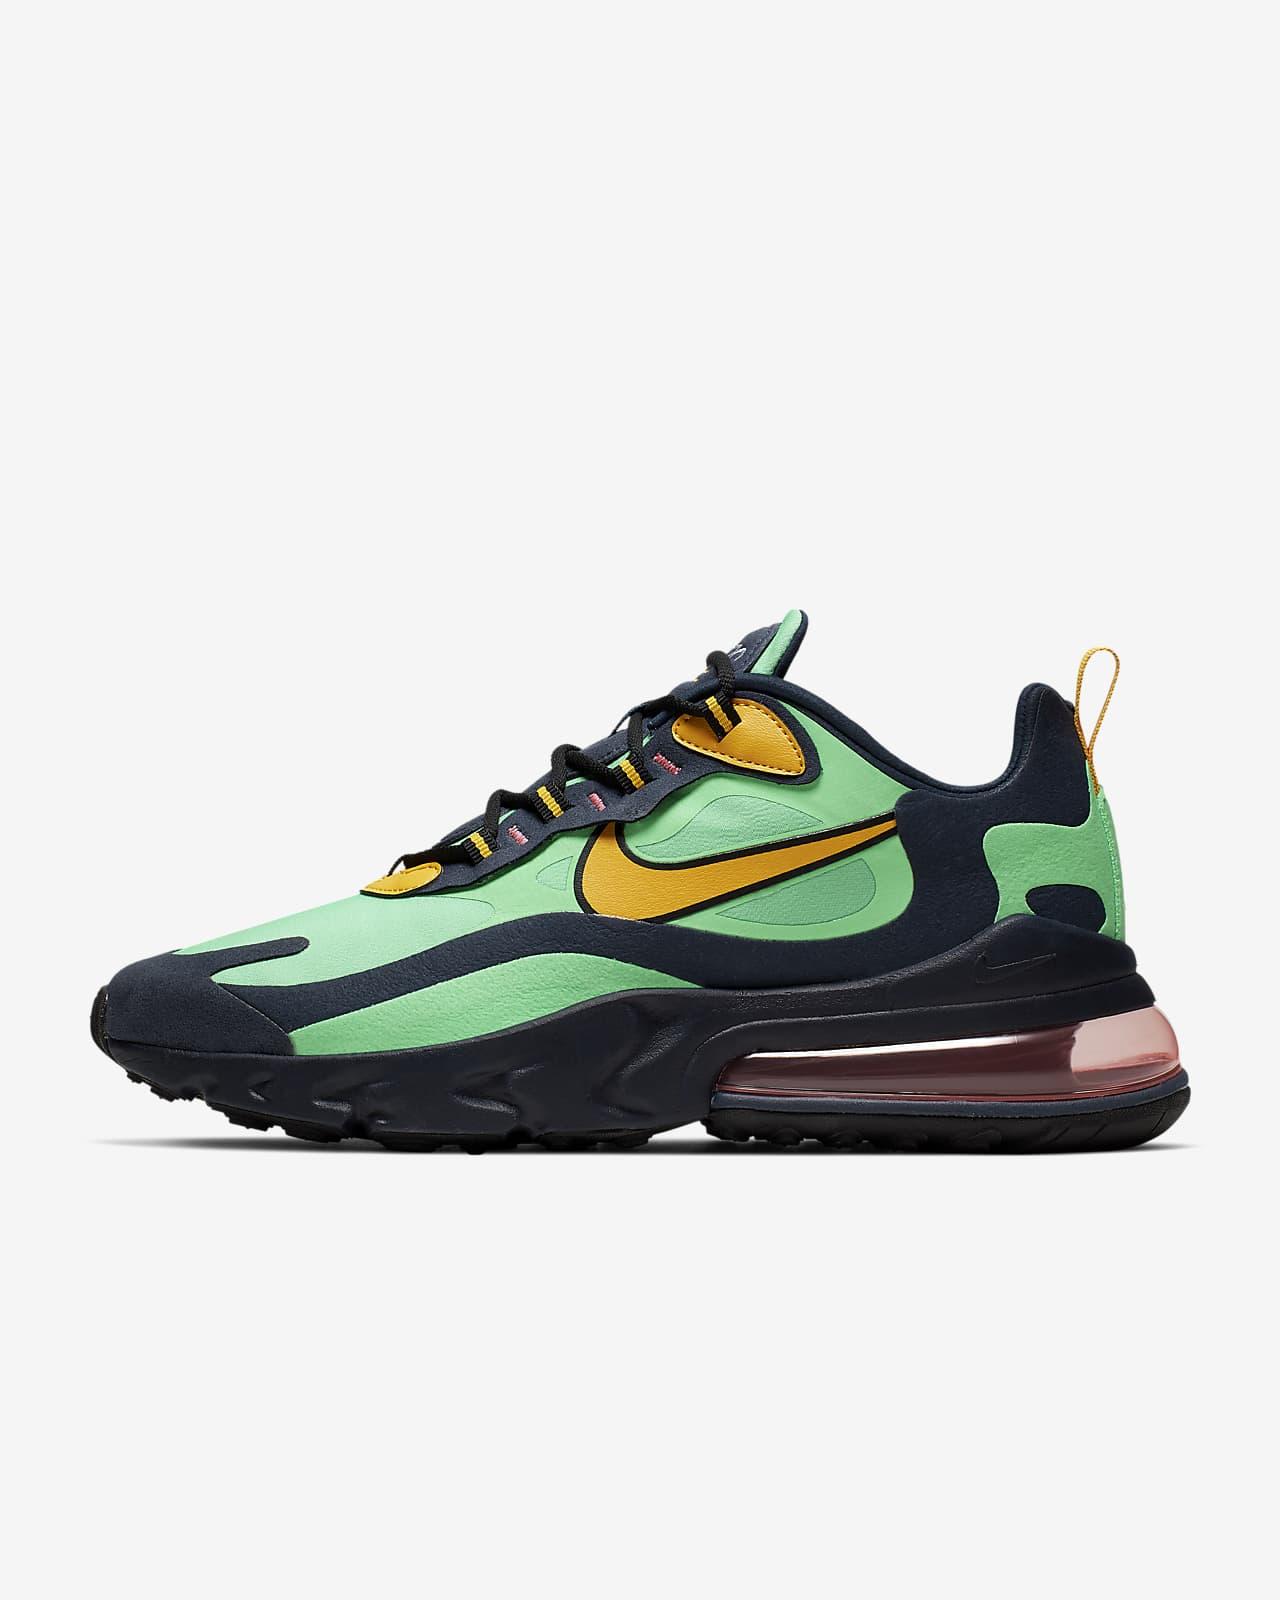 búnker Funcionar Ocurrencia  Nike Air Max 270 React (Pop Art) Men's Shoes. Nike VN